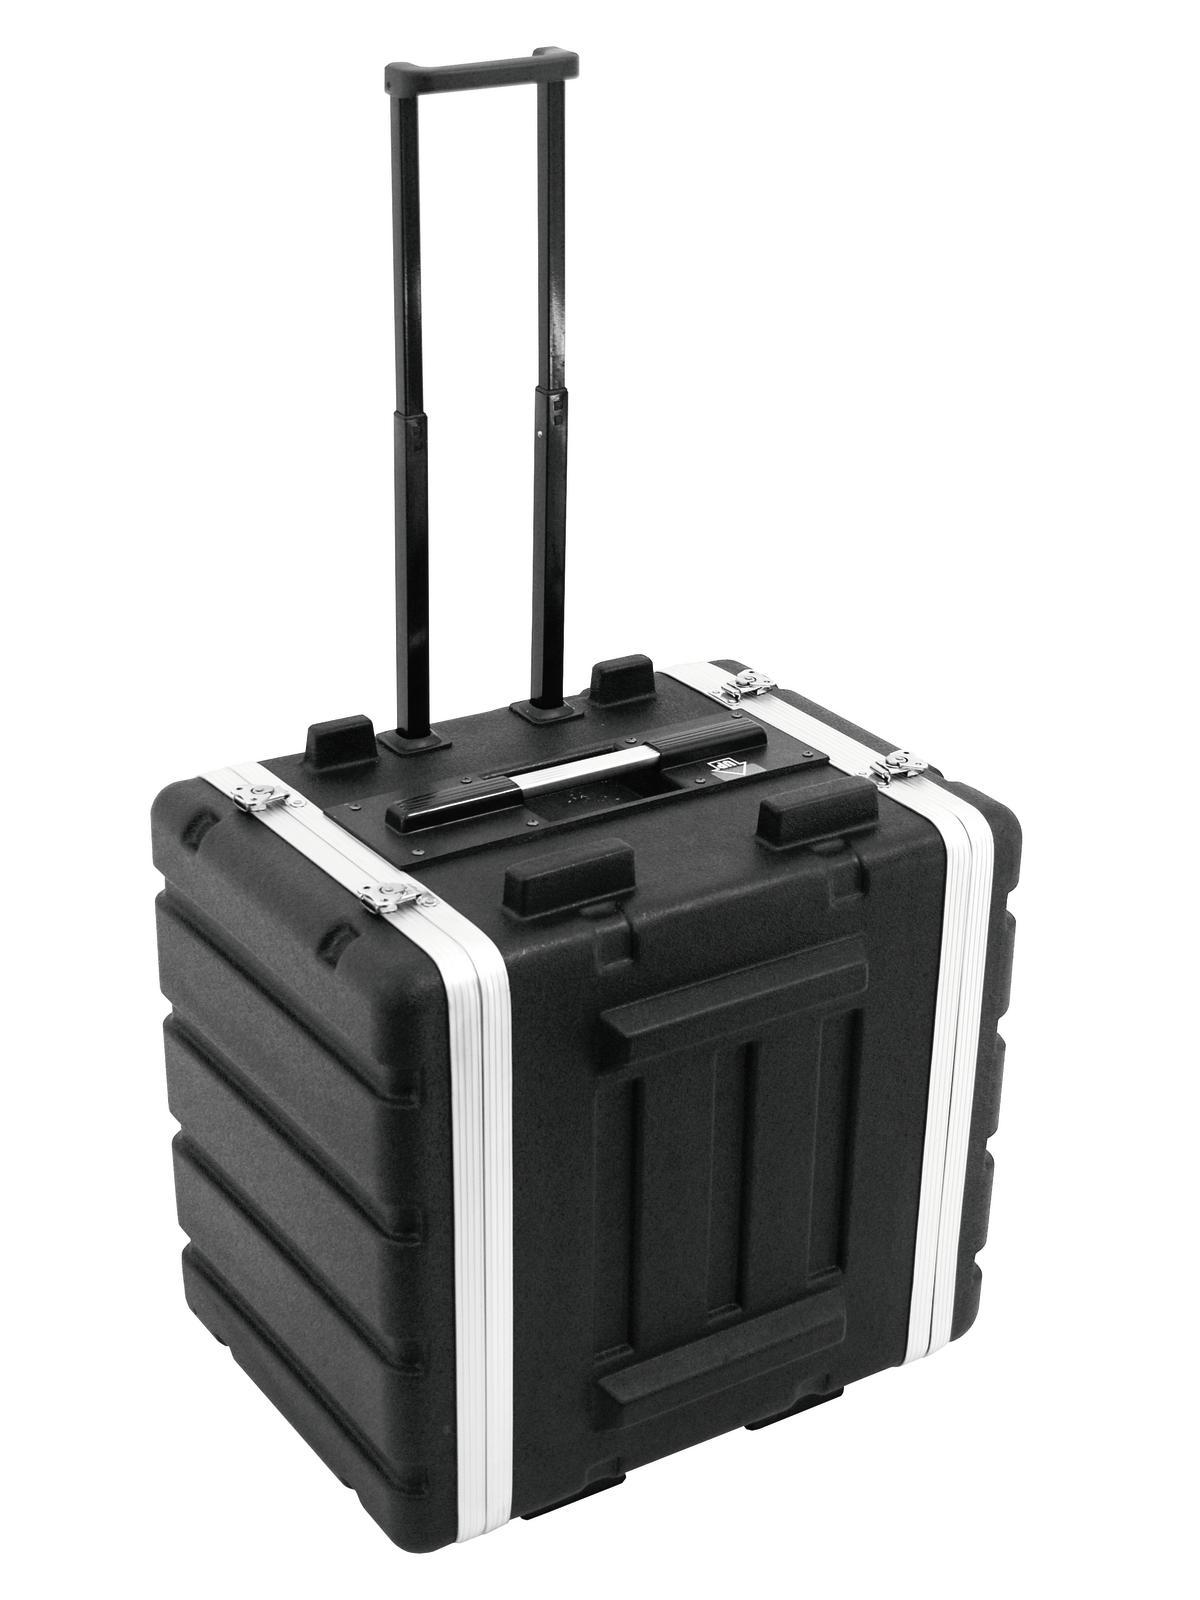 ROADINGER Plastica rack 19, 7U, DD/trolley, nero